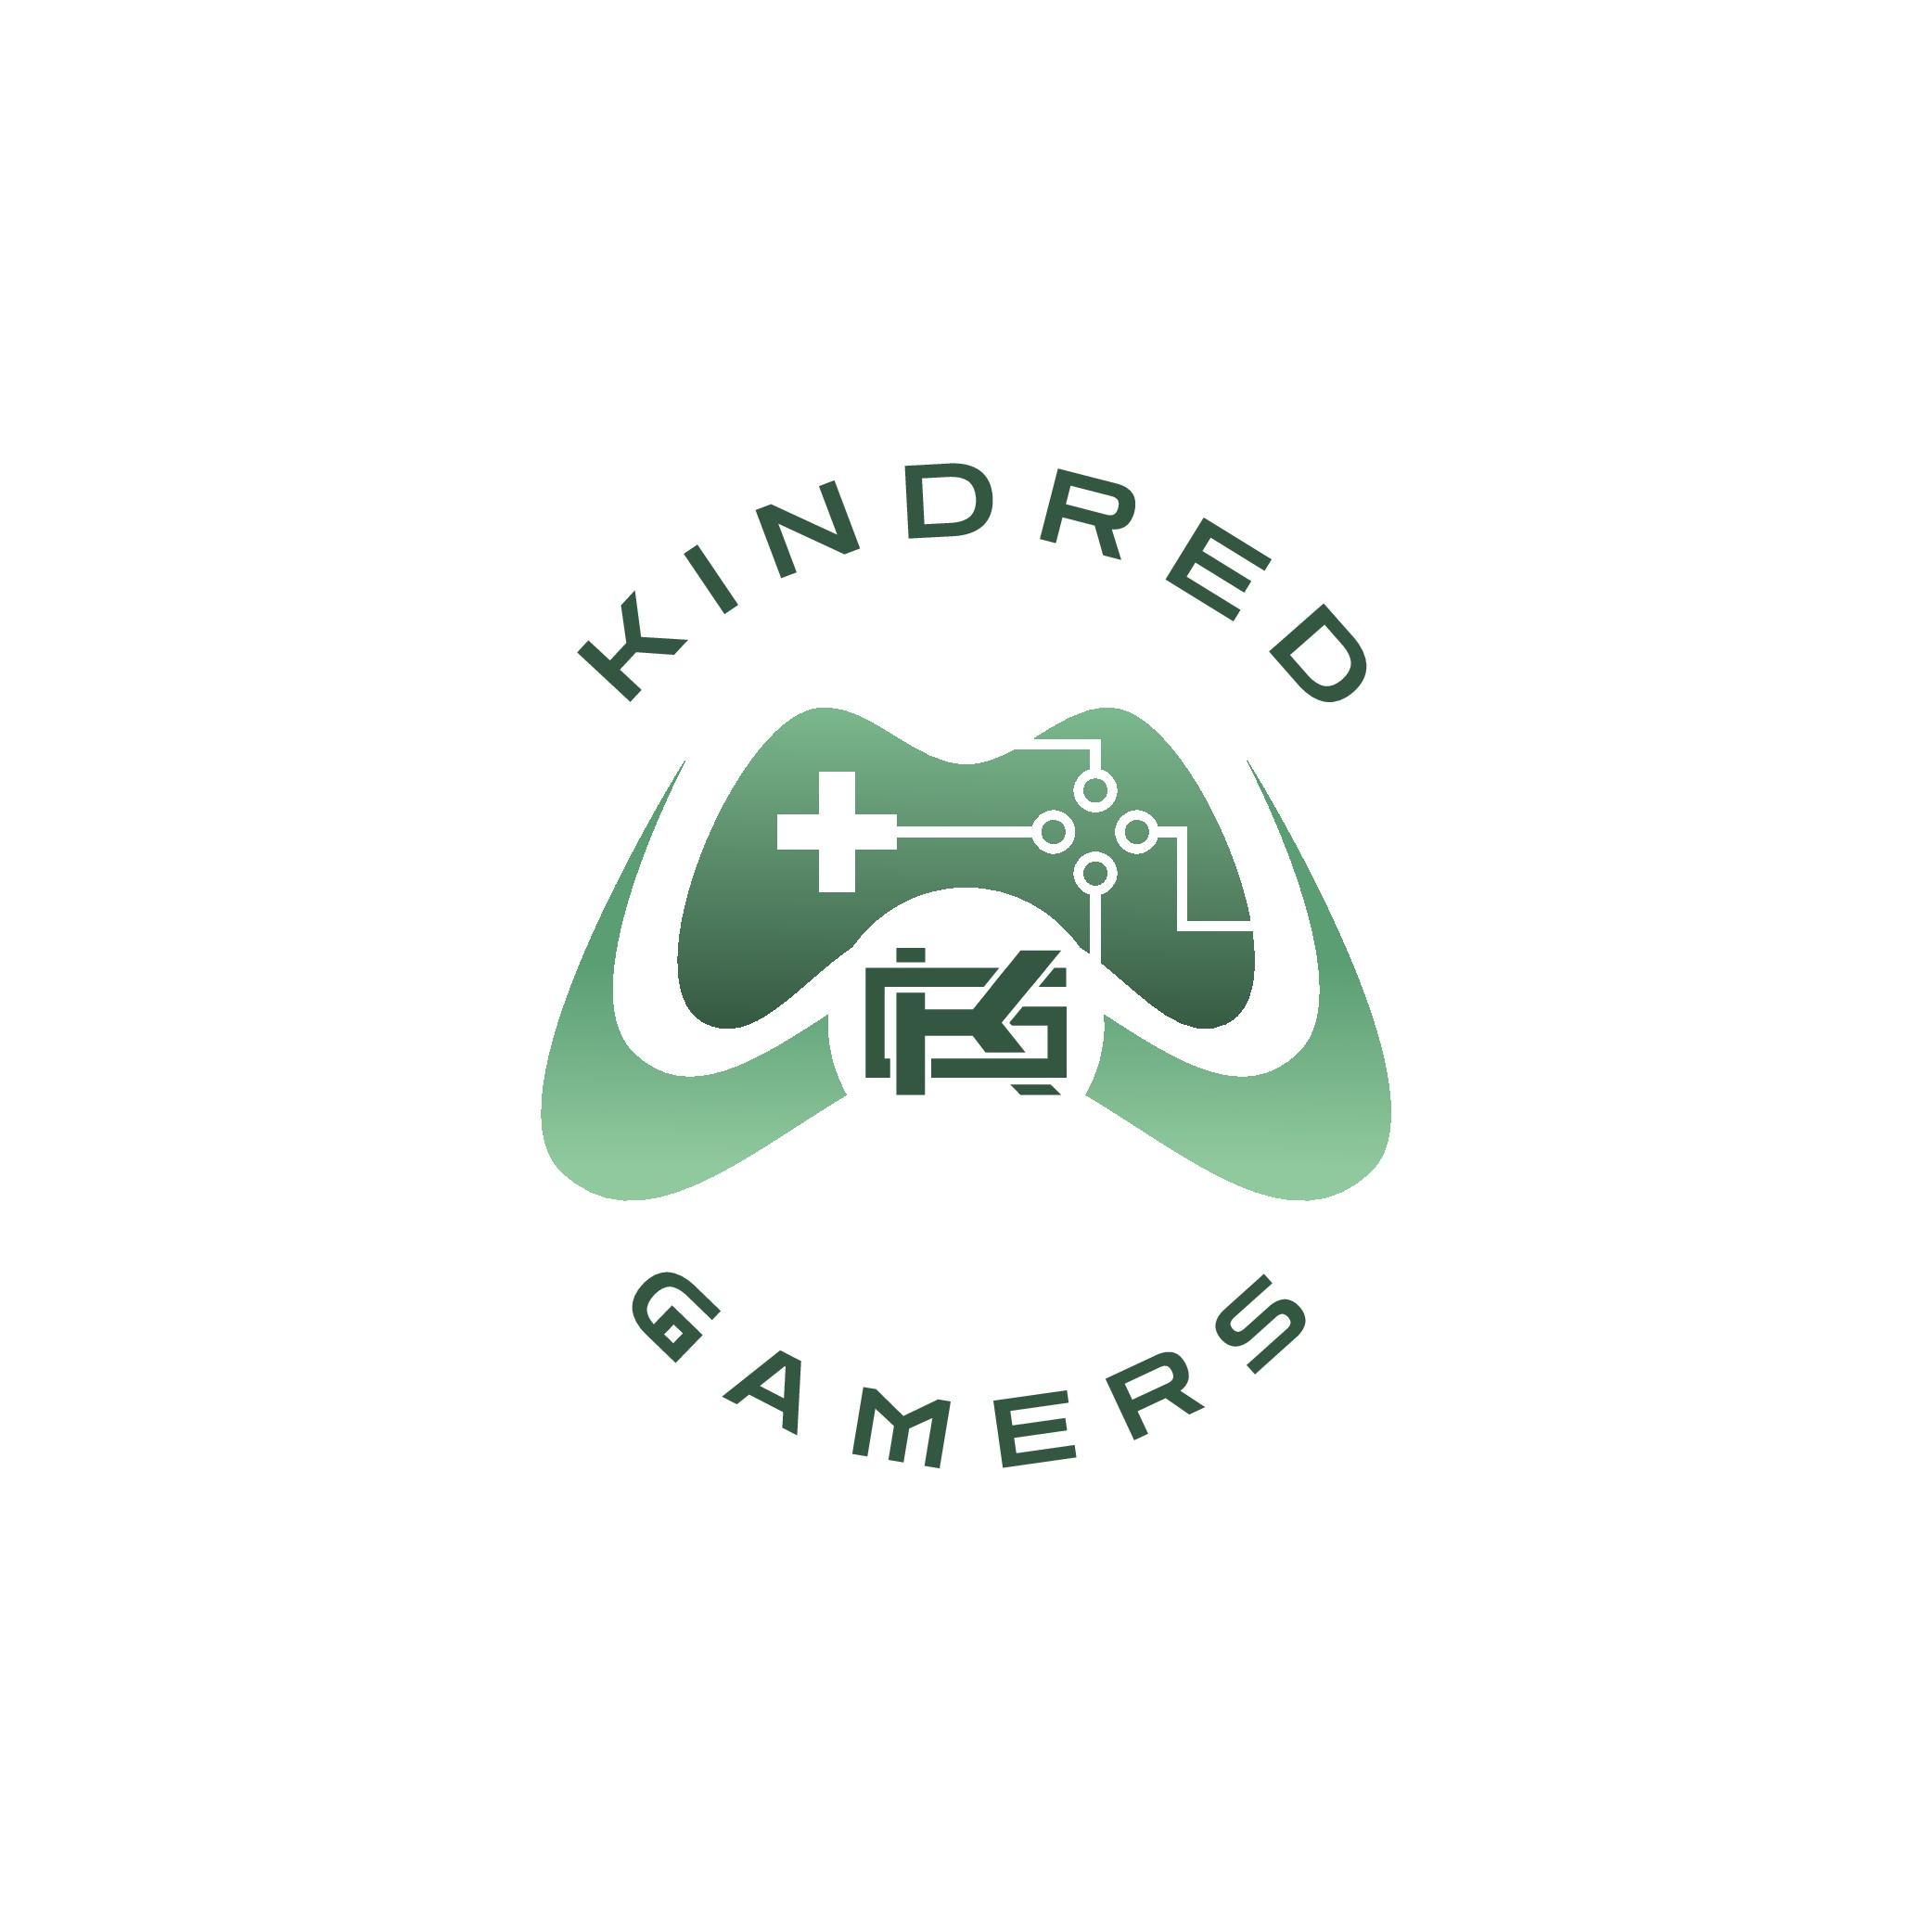 Design a cool logo for a Gamer's social media site